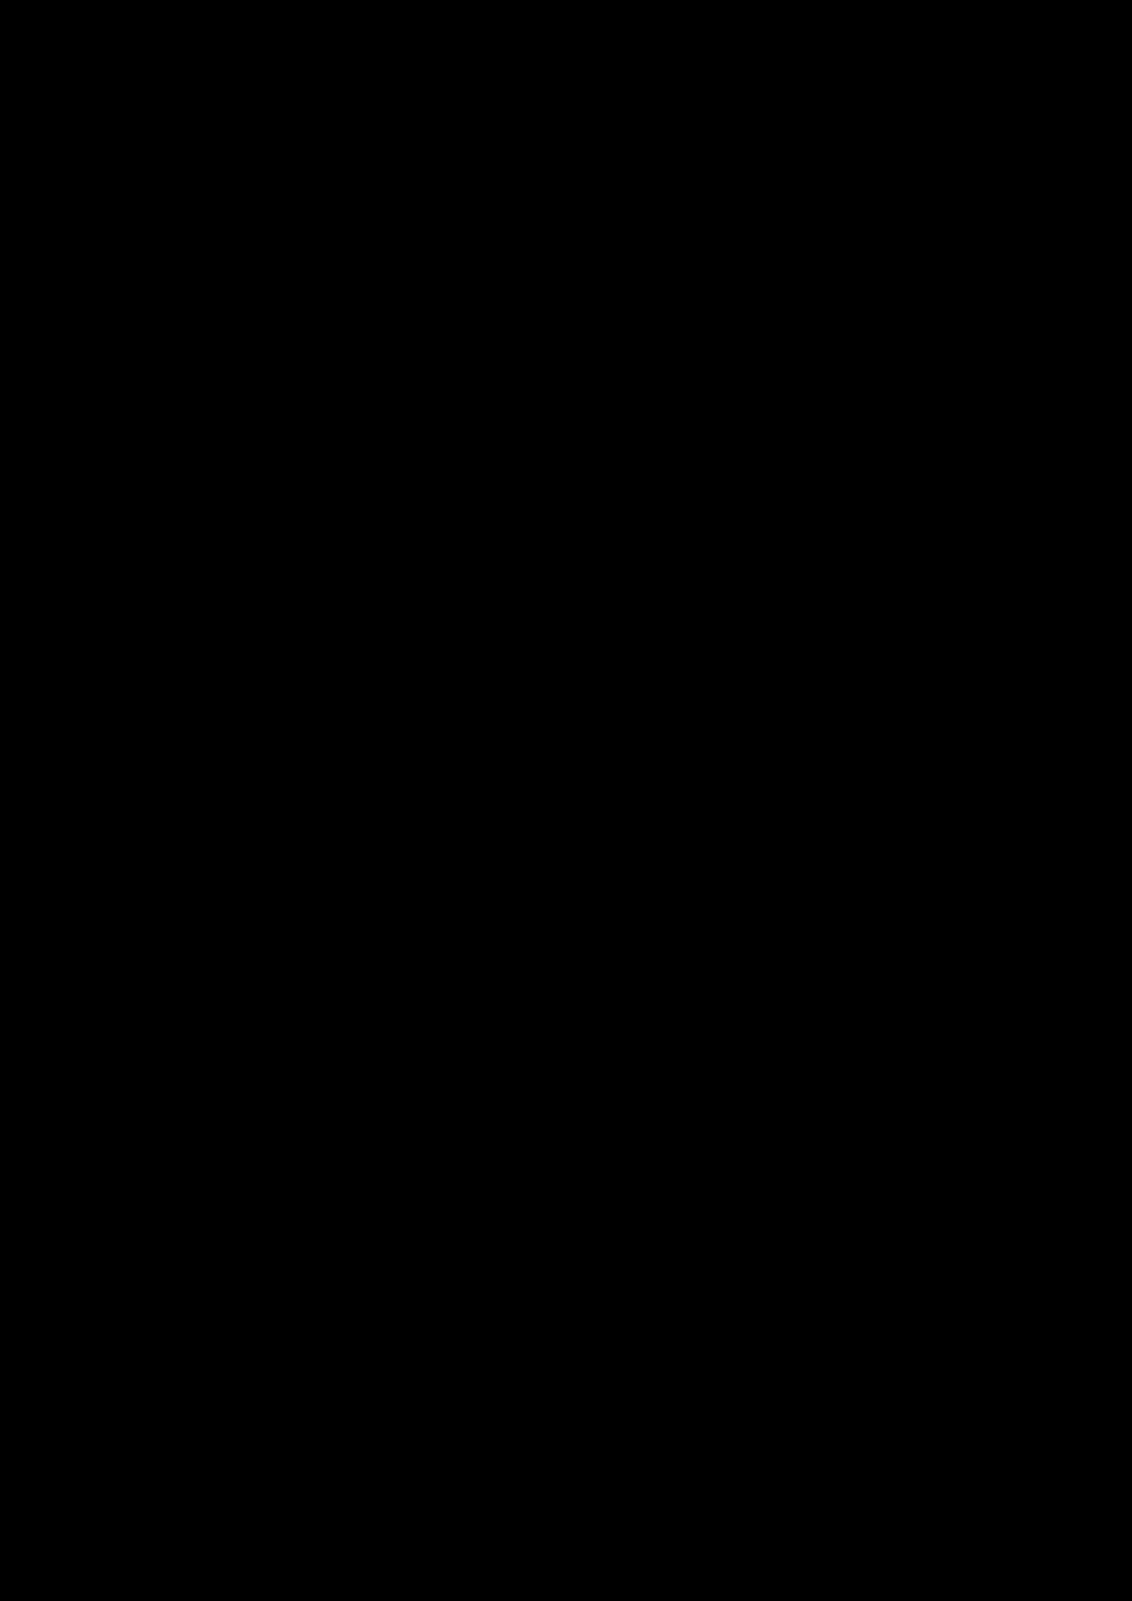 Belyiy sokol slide, Image 161